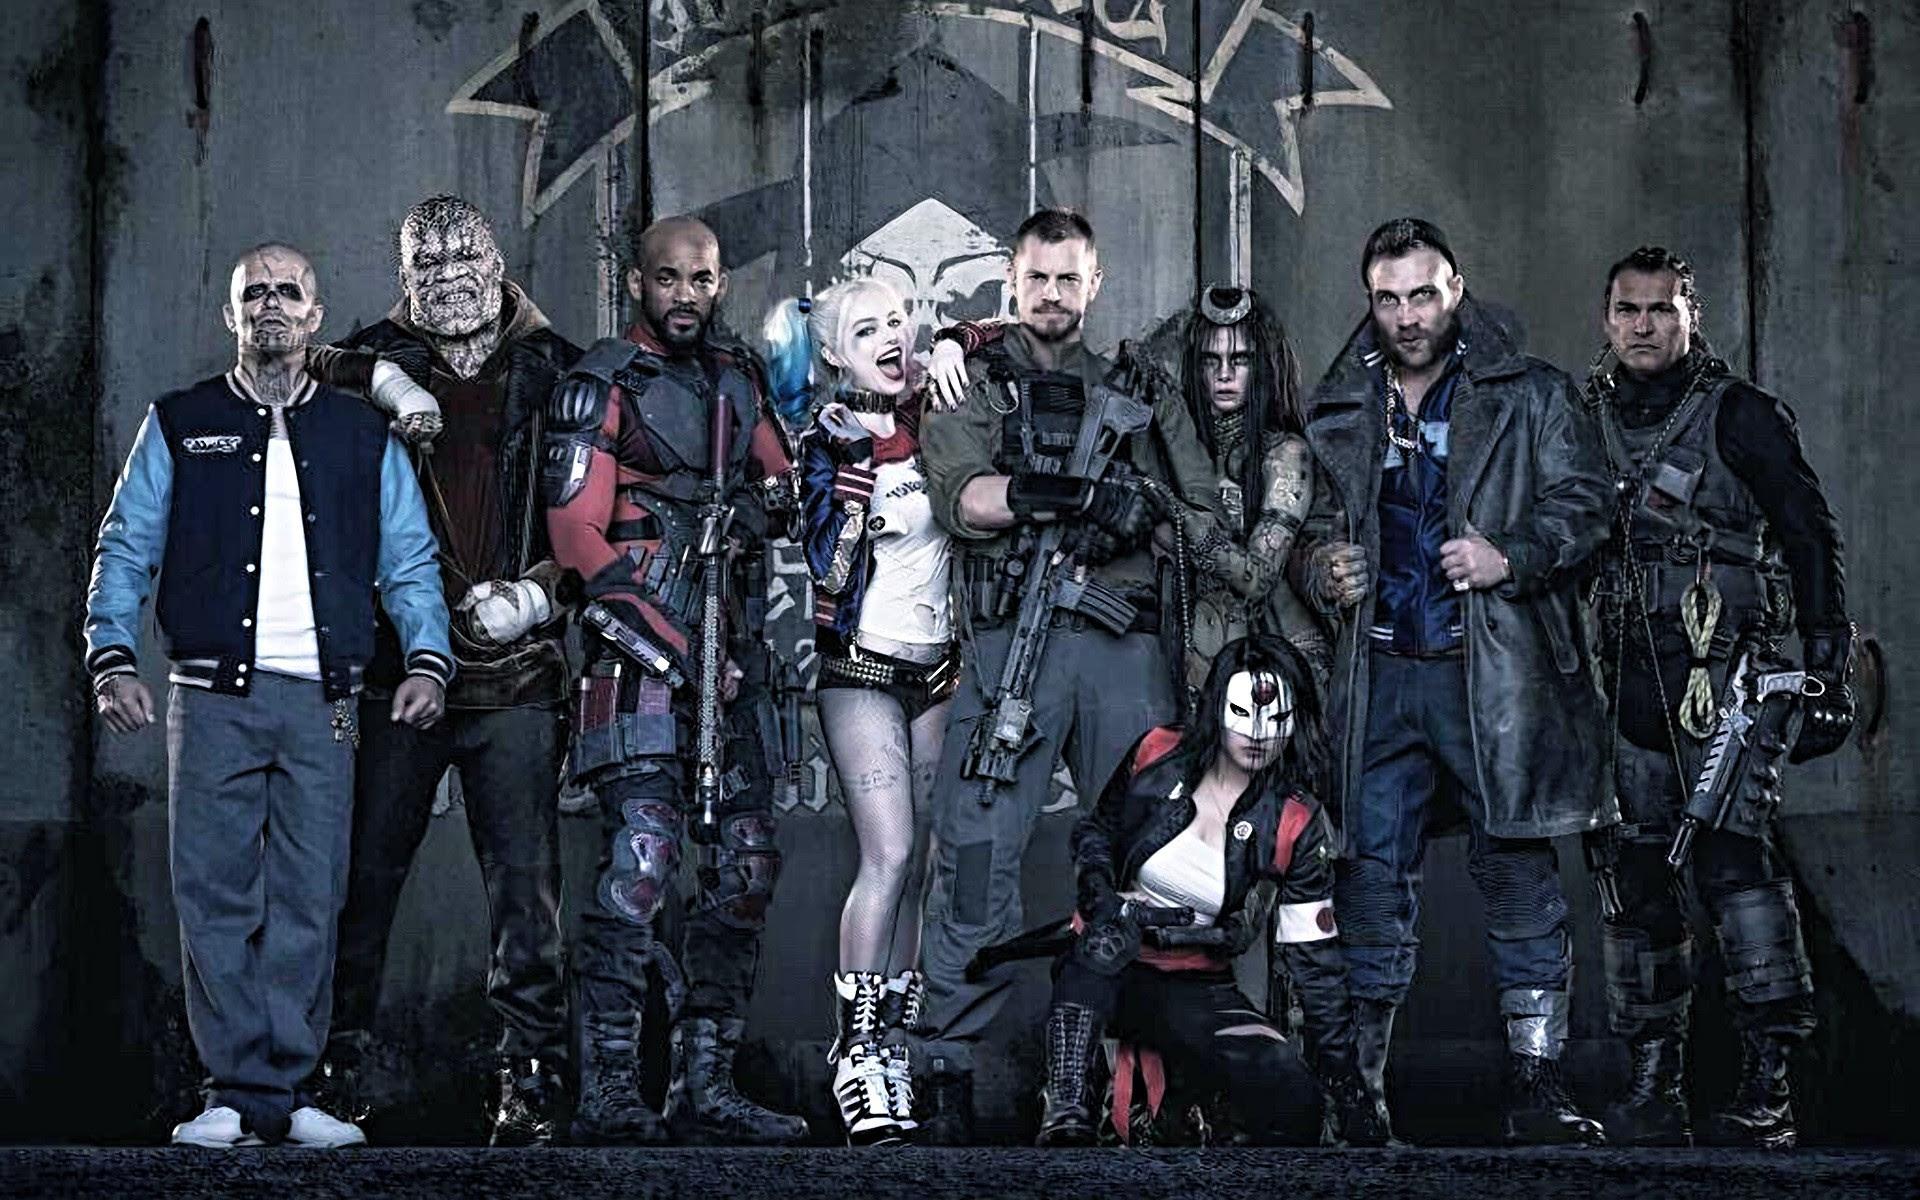 Confira os novos, fofos e minimalistas 10 posters ilustrados de Suicide Squad!